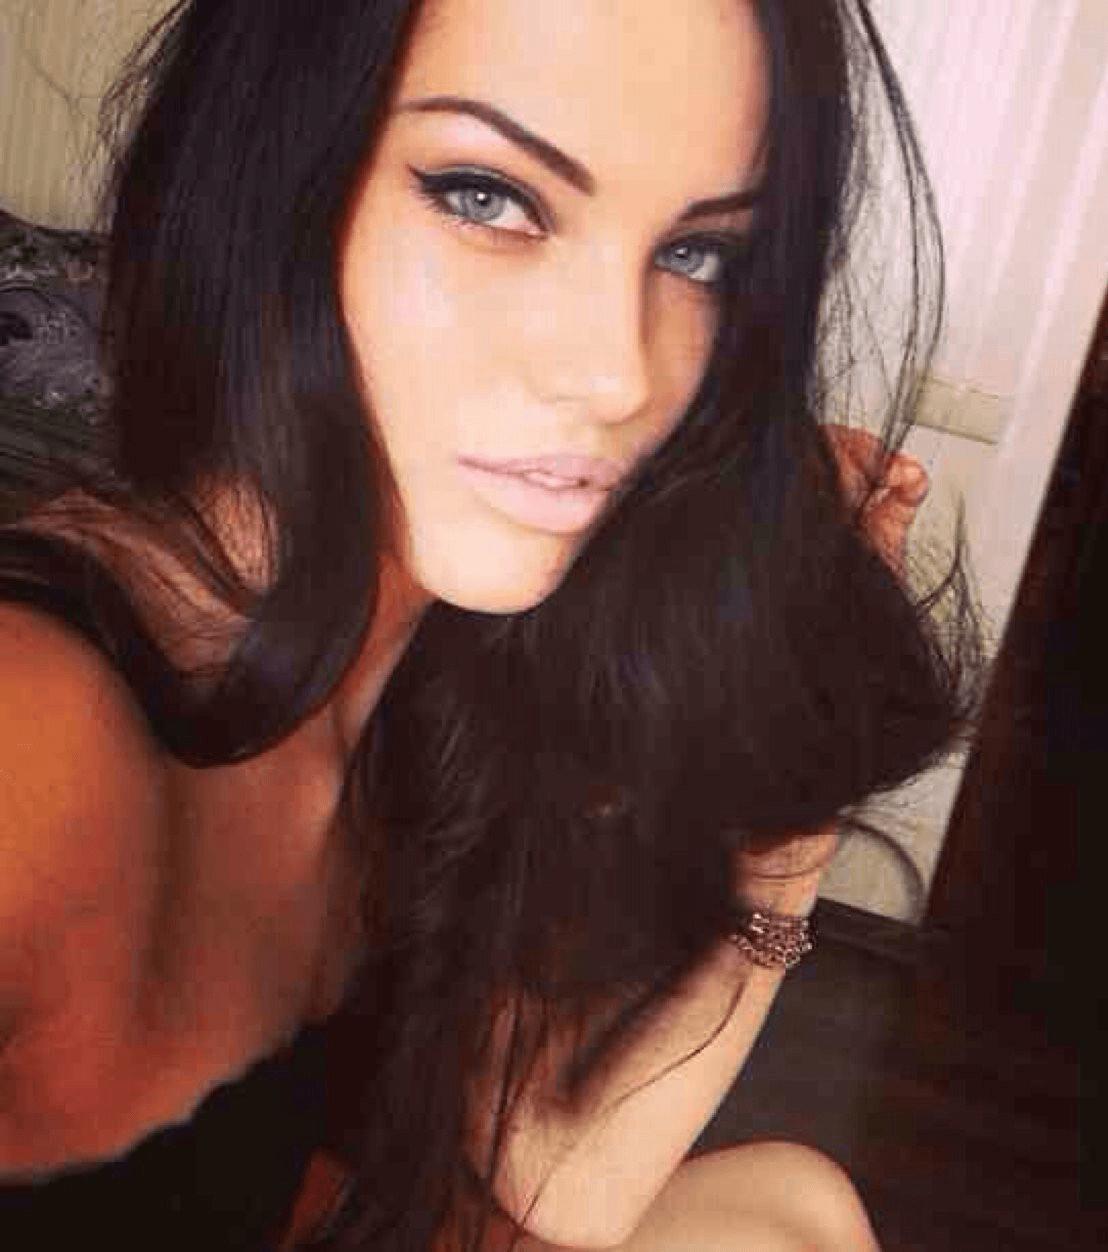 jolie salope brune femme pute algerienne